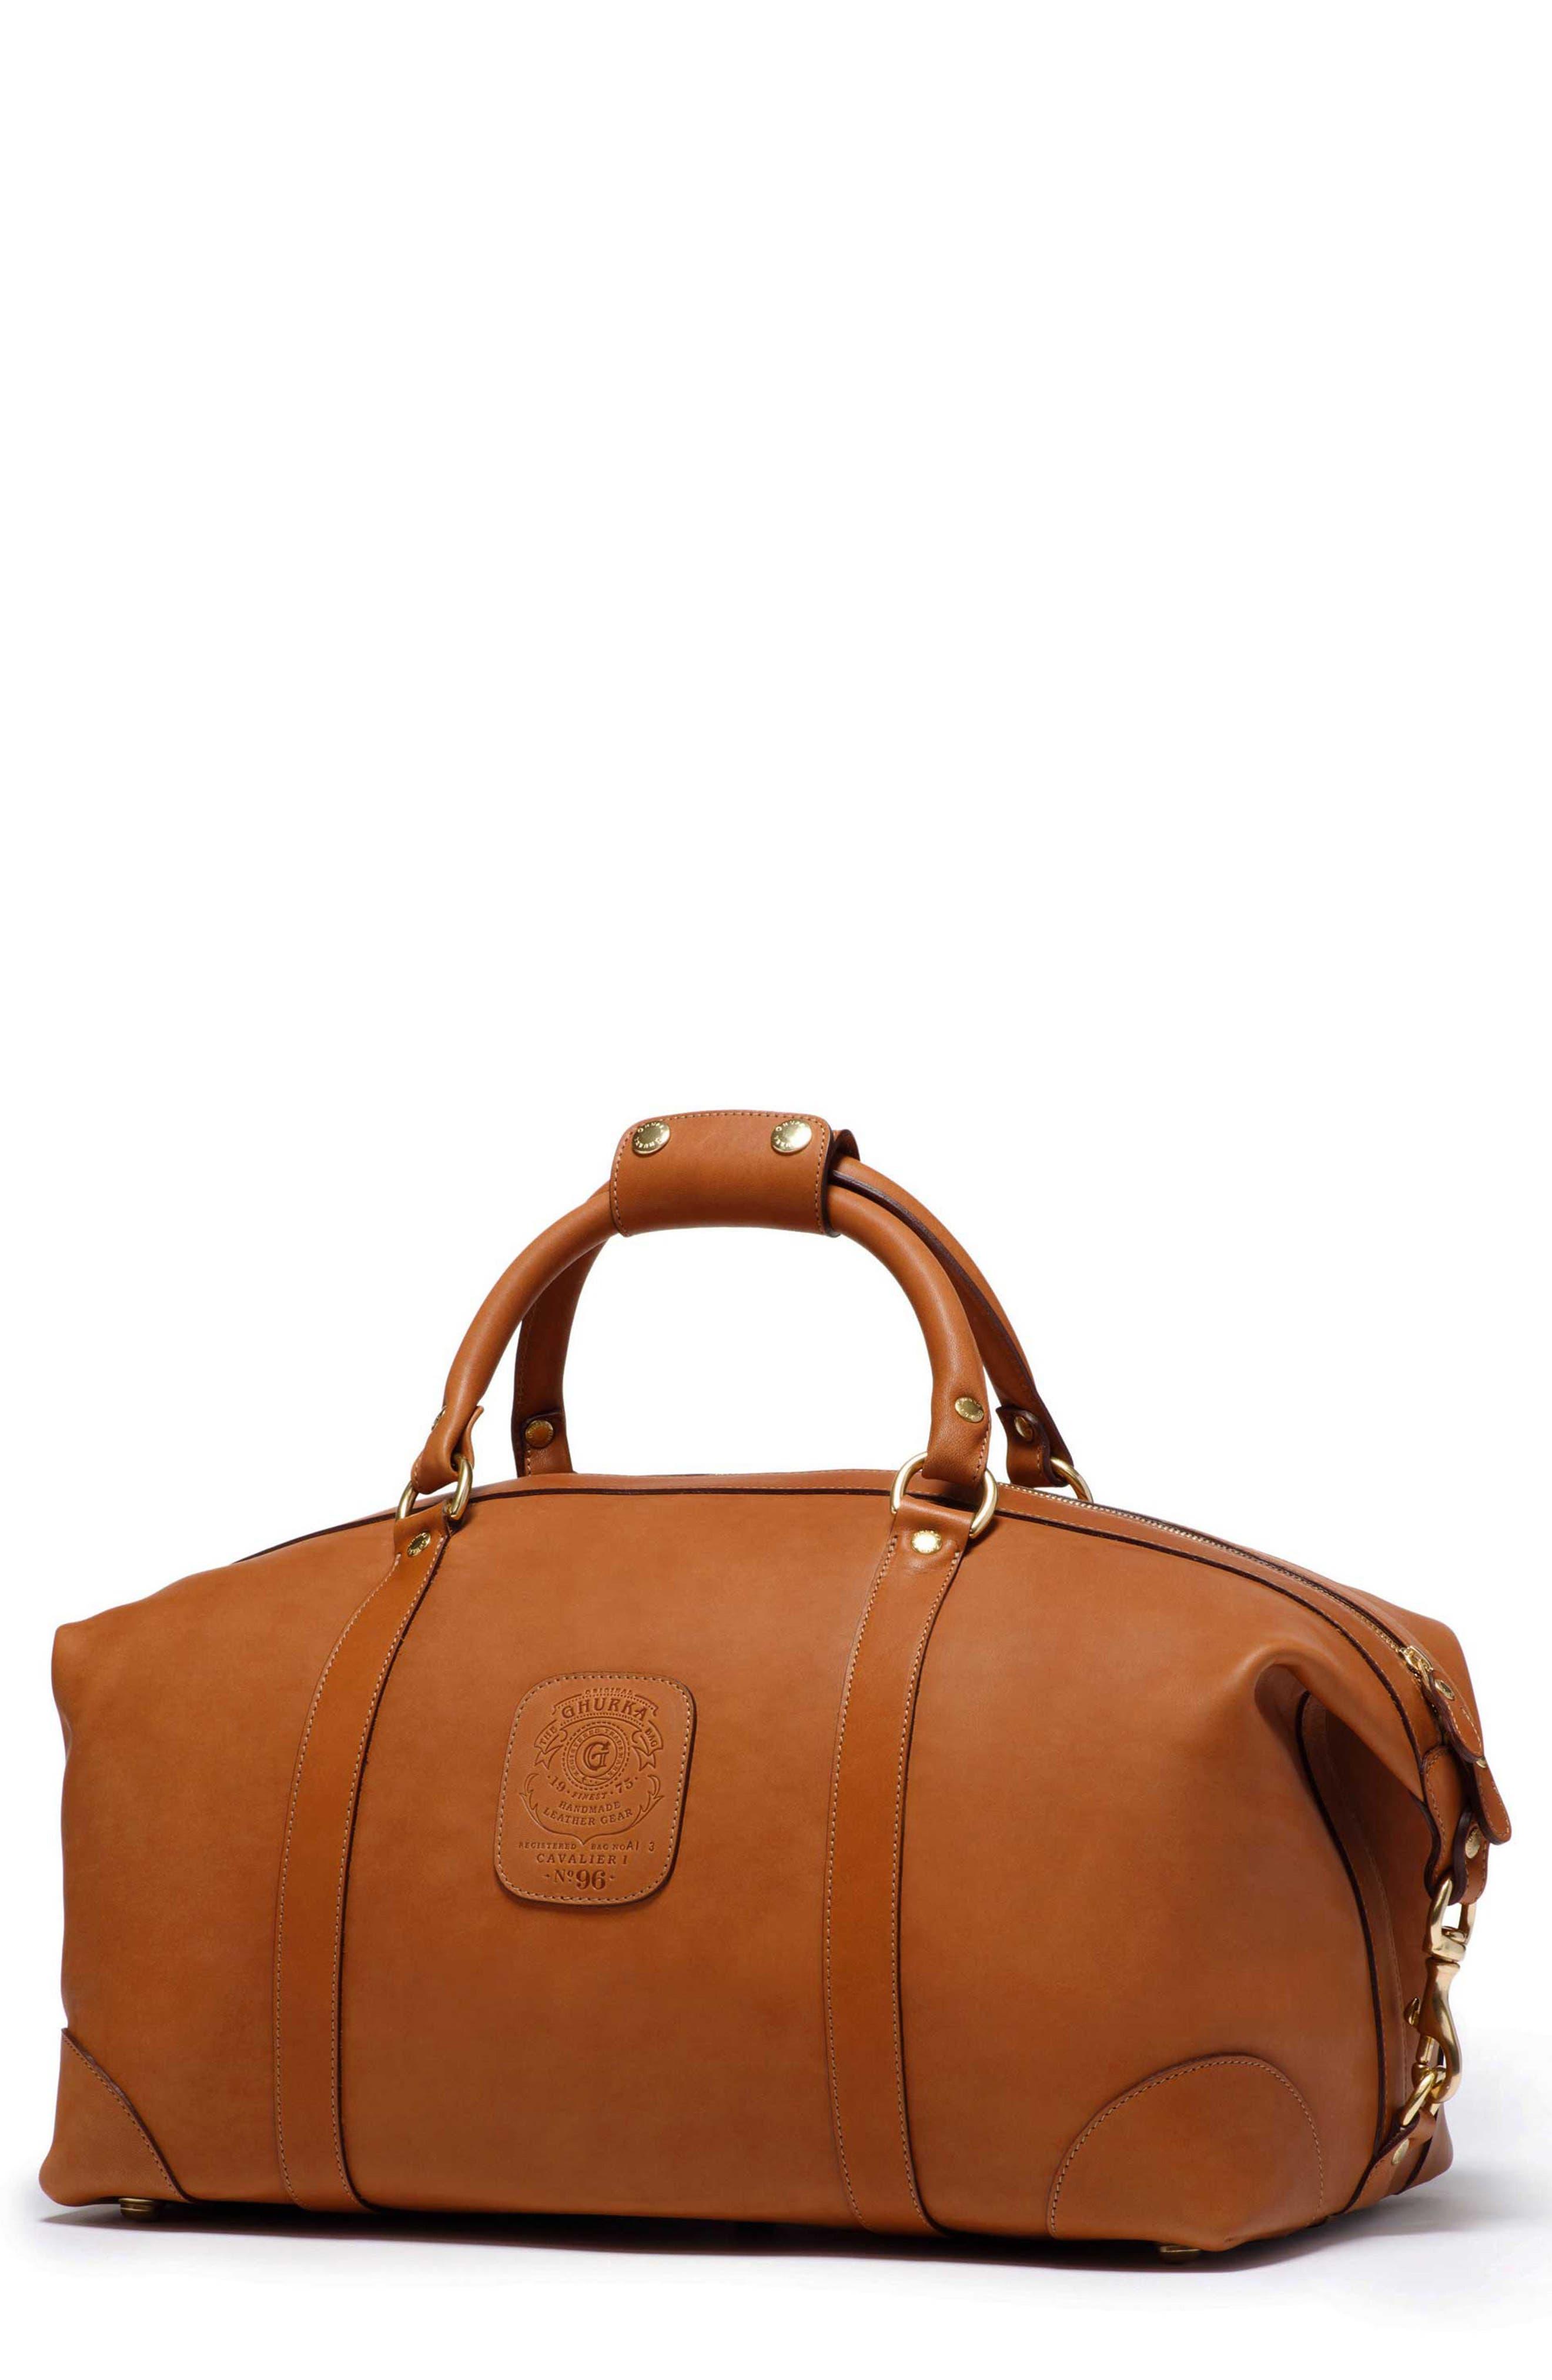 Ghurka Cavalier I Leather Duffel Bag